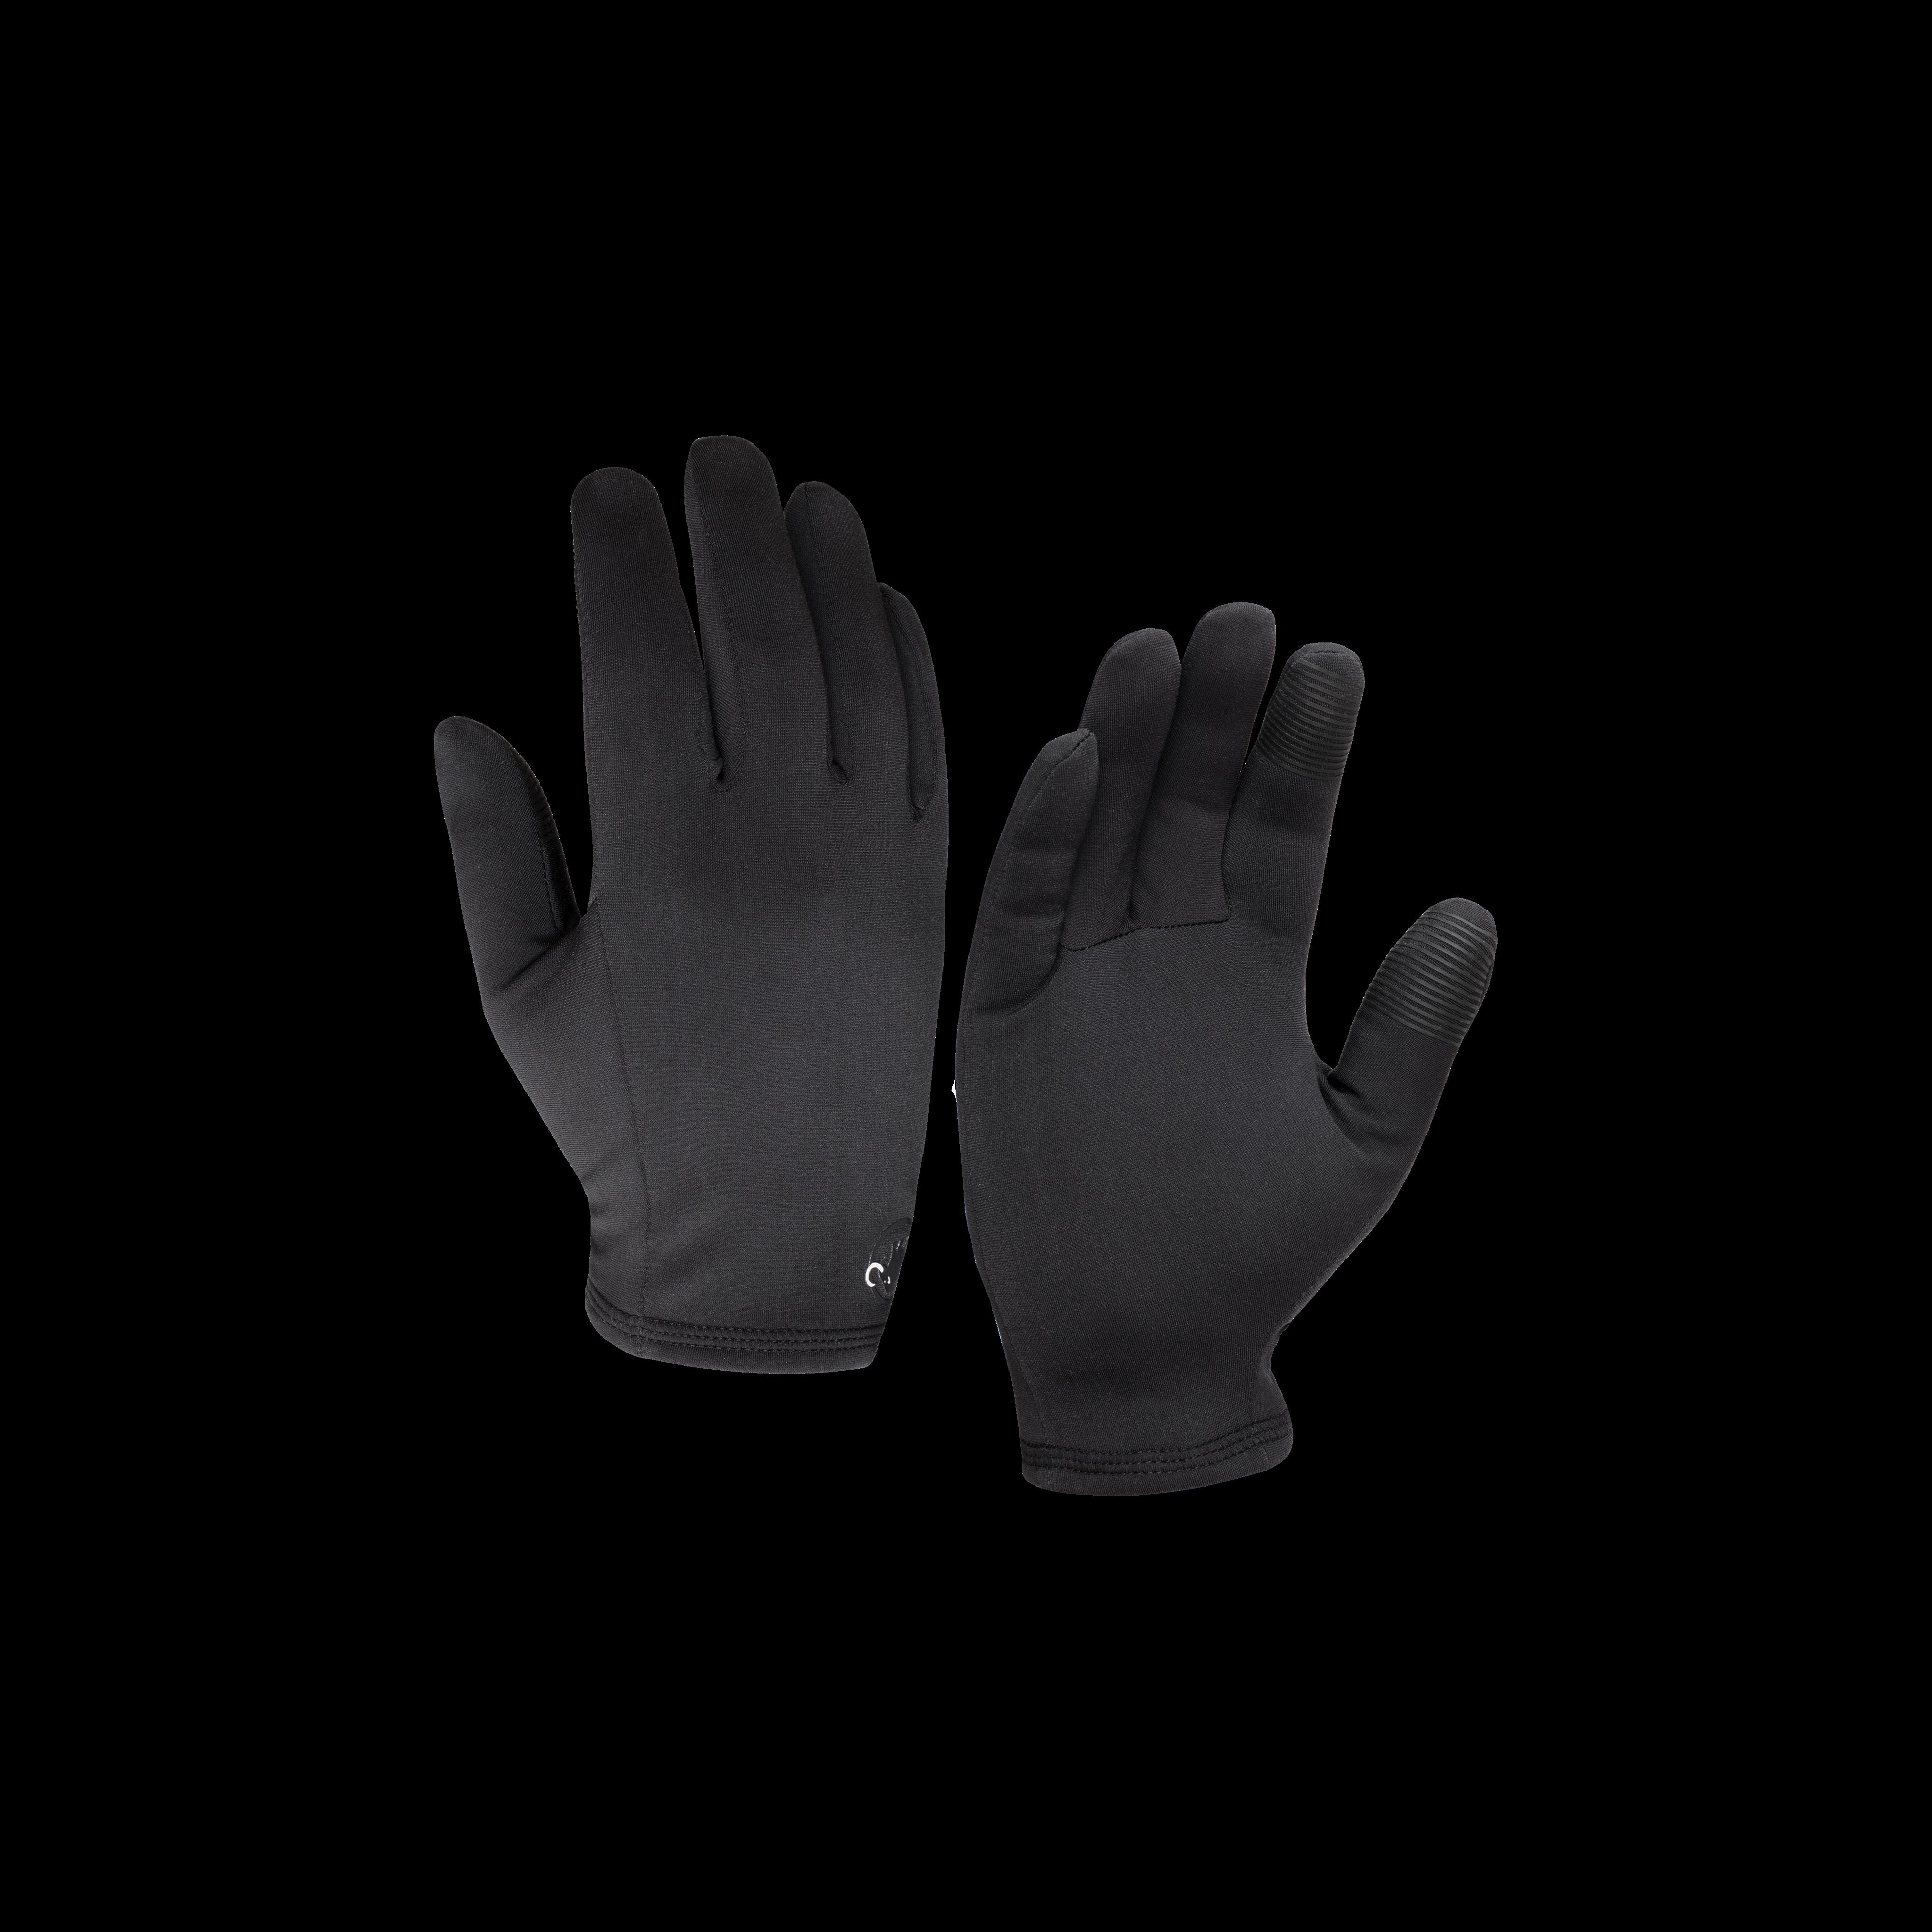 Stretch Glove - 9, black thumbnail